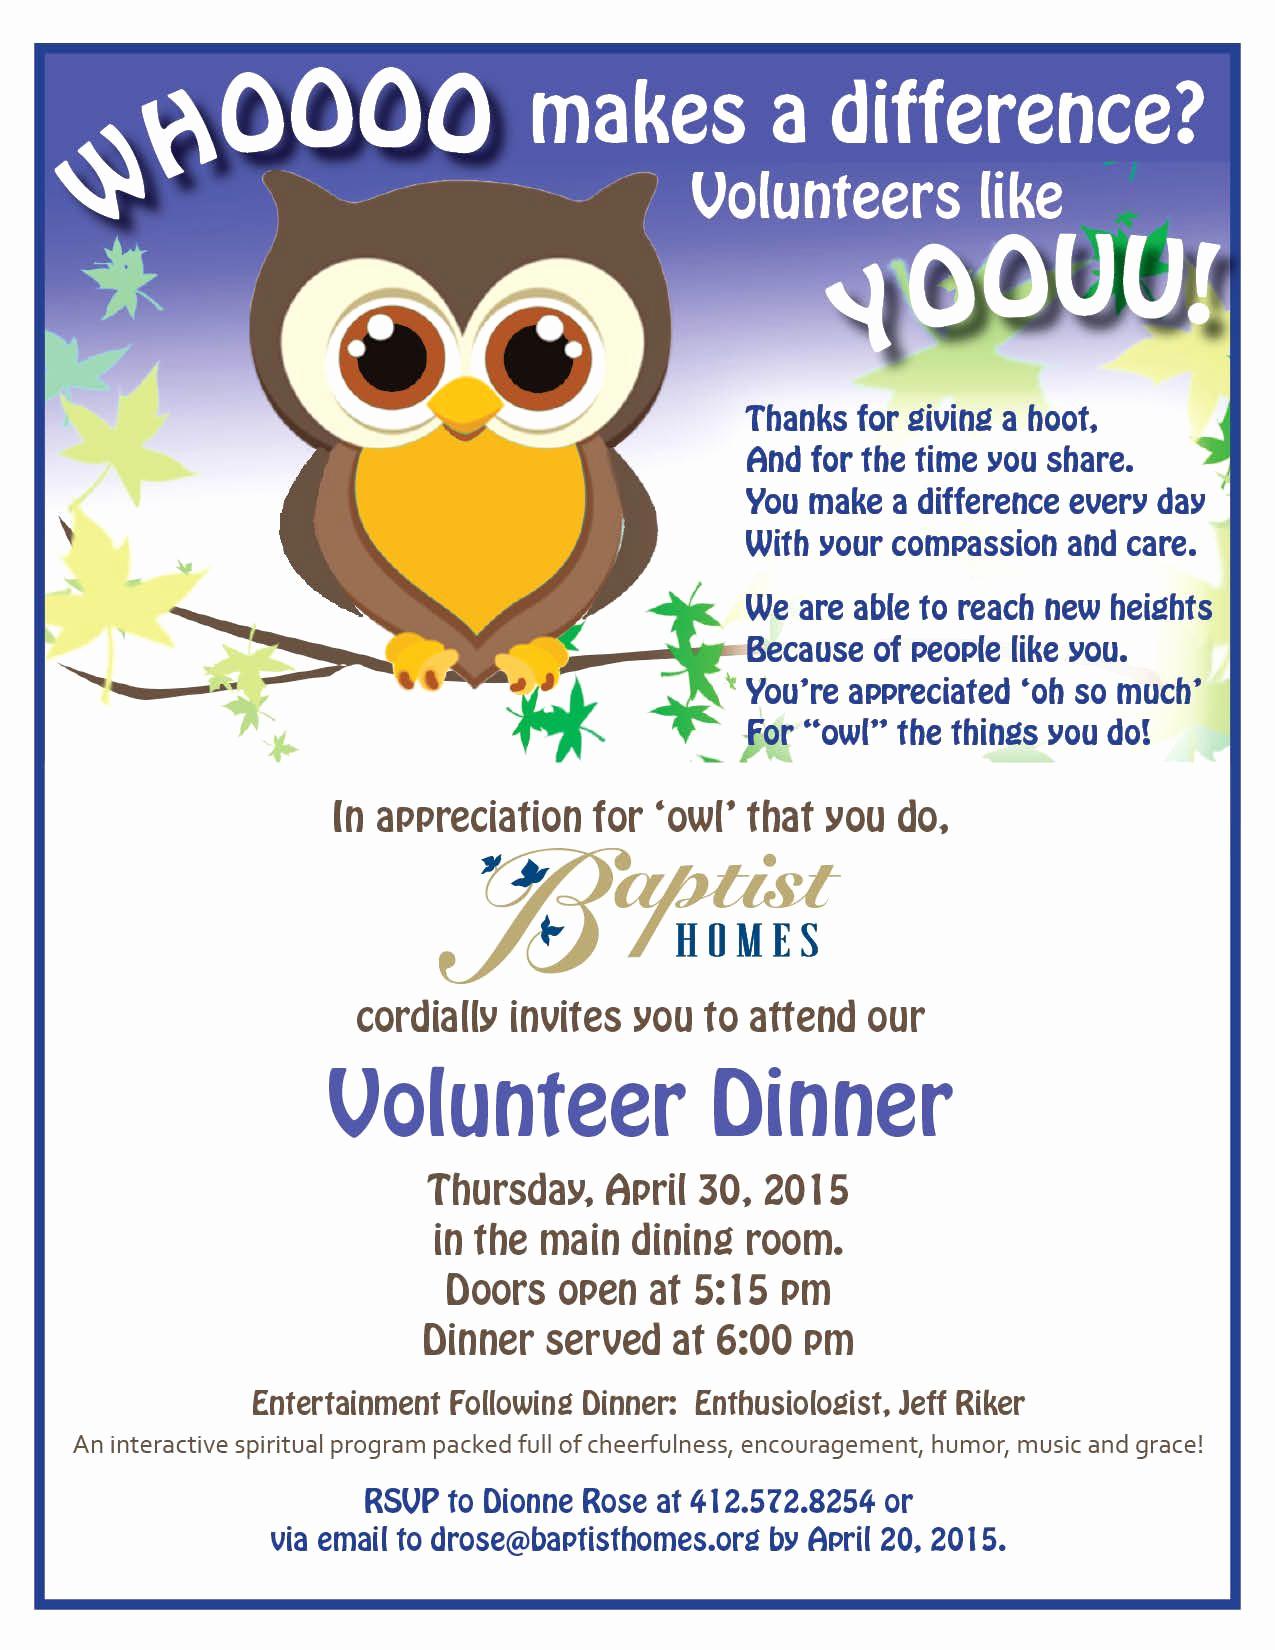 Volunteer Appreciation Invitation Wording Beautiful Baptist Homes Volunteer Banquet Invitations How to